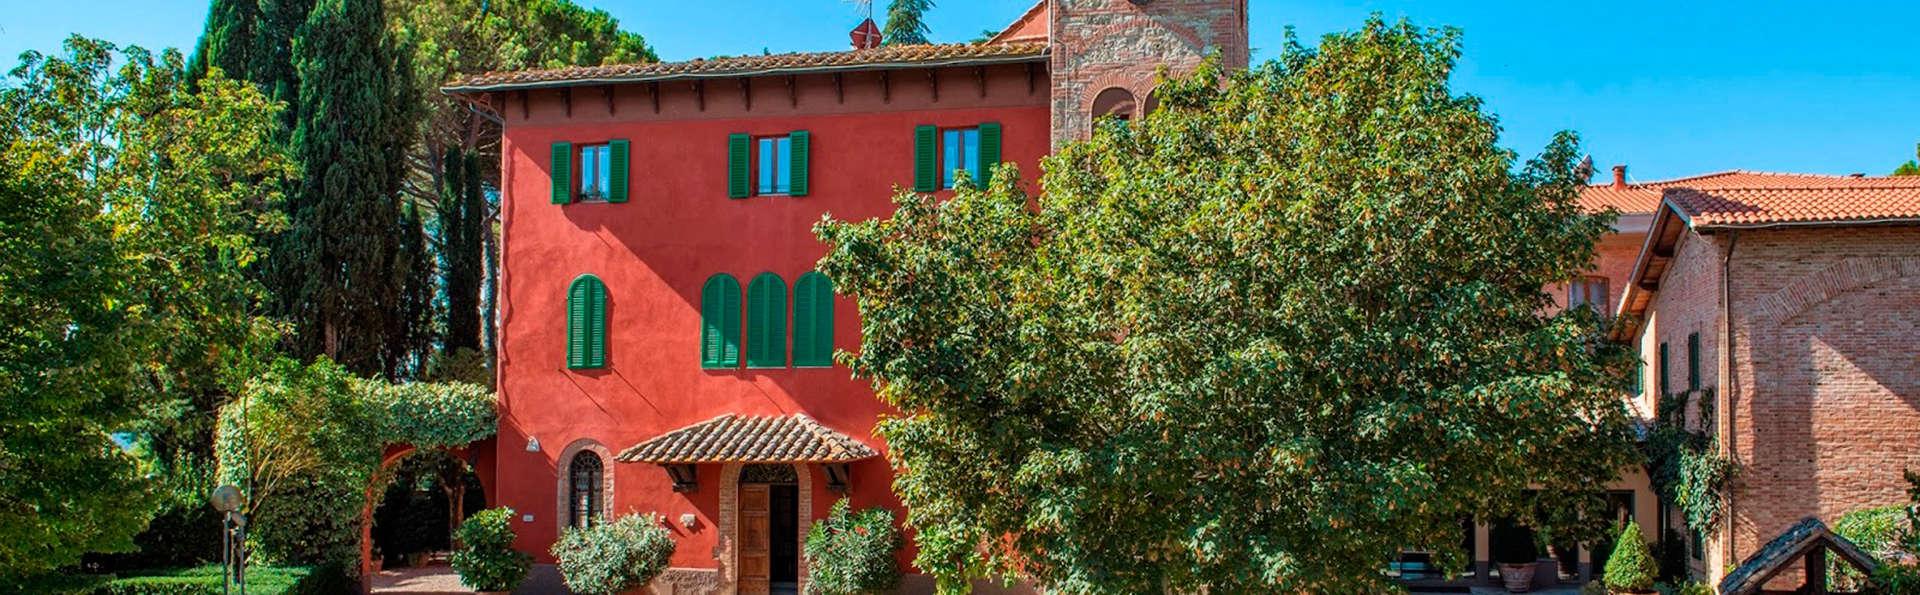 Hotel Villa Il Patriarca - EDIT_front1.jpg